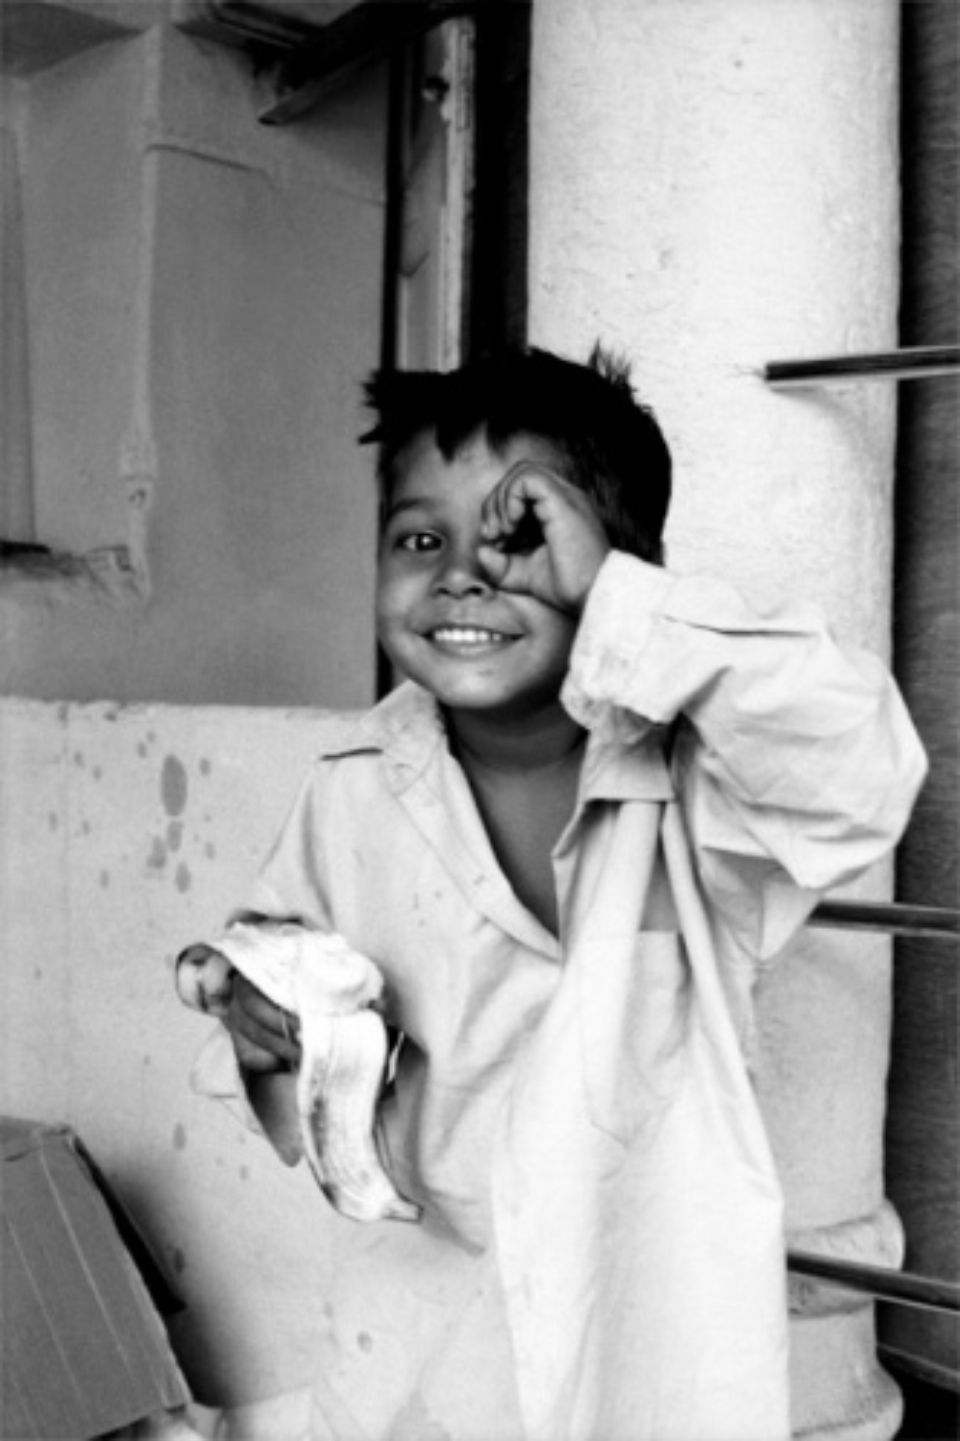 Amy Lyne: Peek-a-boo Pushkar, 2003 Gelatin Silver Print